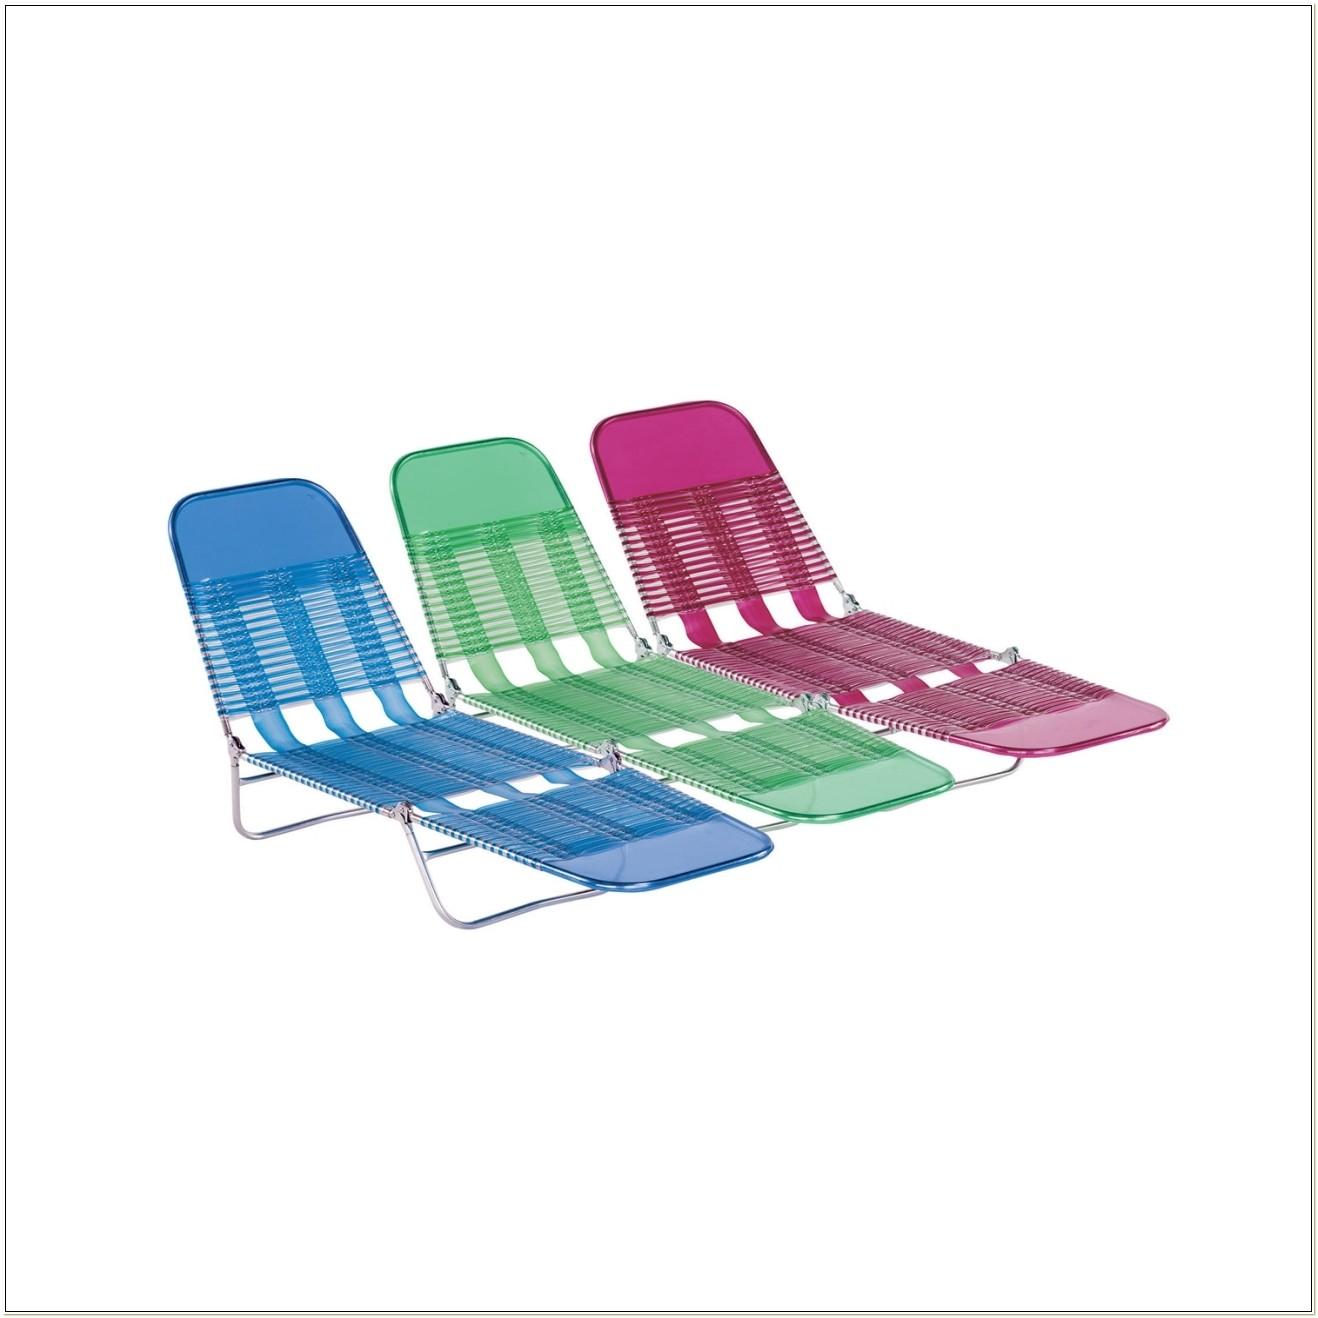 Tri Fold Lawn Chairs